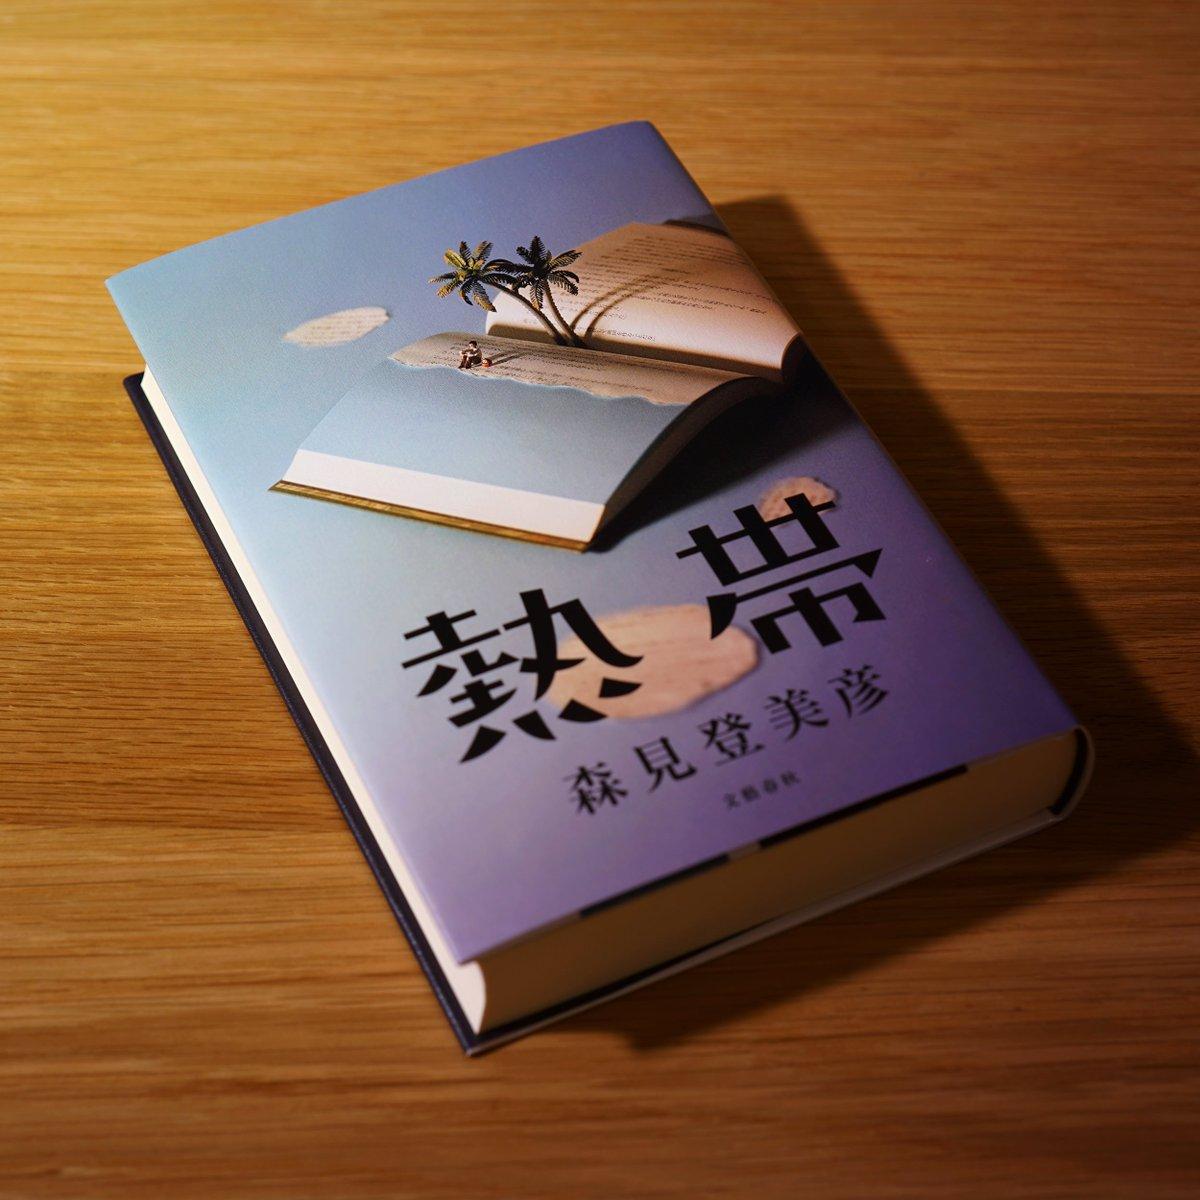 RT @tanaka_tatsuya: 装画を担当させていただいた、 森見登美彦さんの「熱帯」が本日発売です! https://t.co/6qqPrVjHET #熱帯の装画を撮ったカメラで熱帯を撮る https://t.co/iWvWGP594O